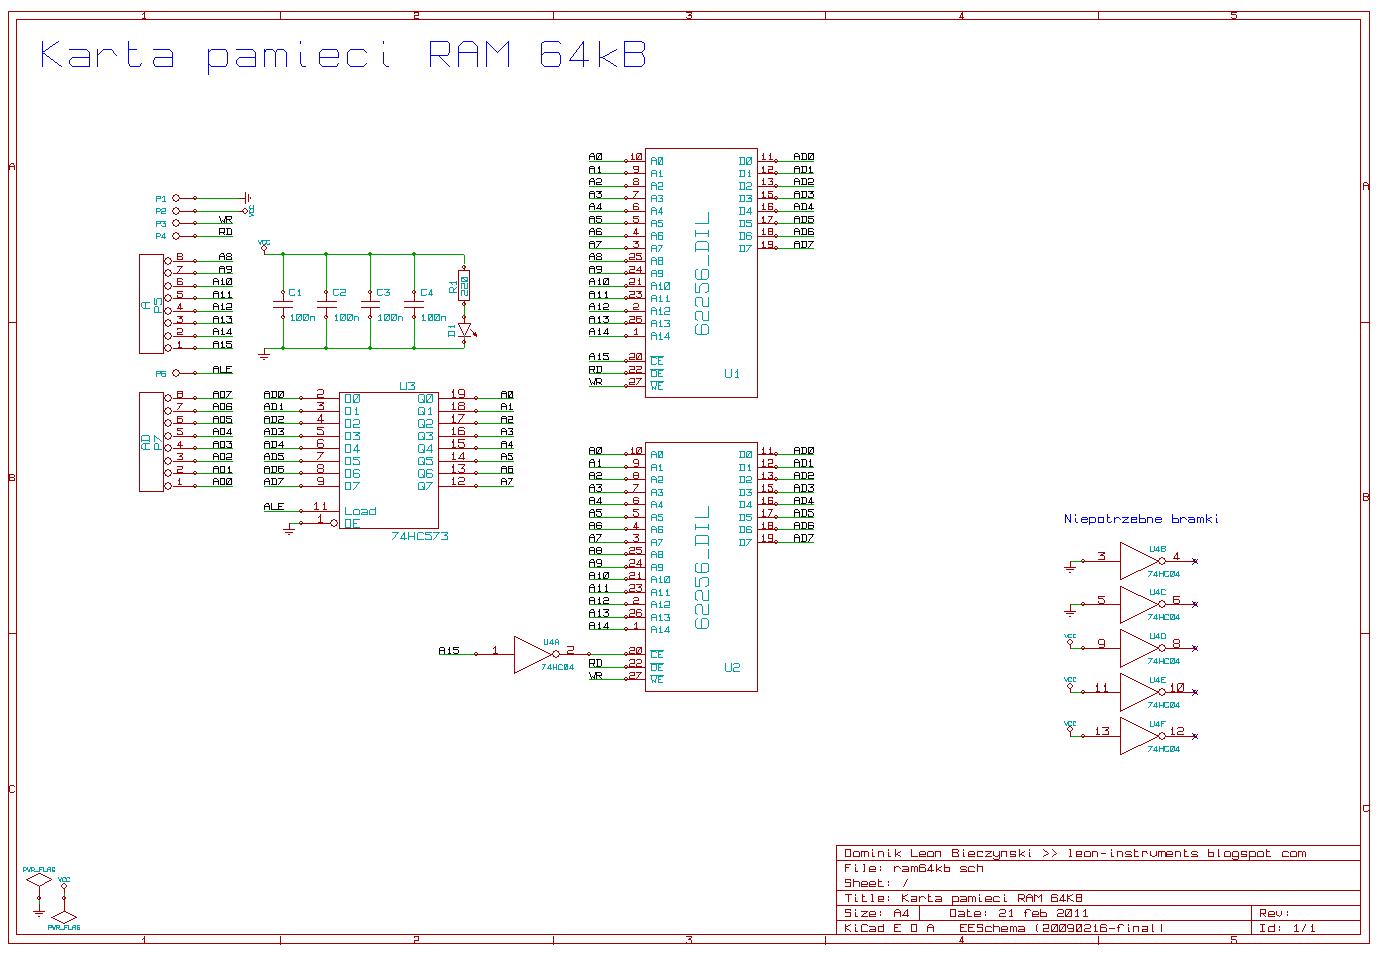 Schemat karty pamięci RAM